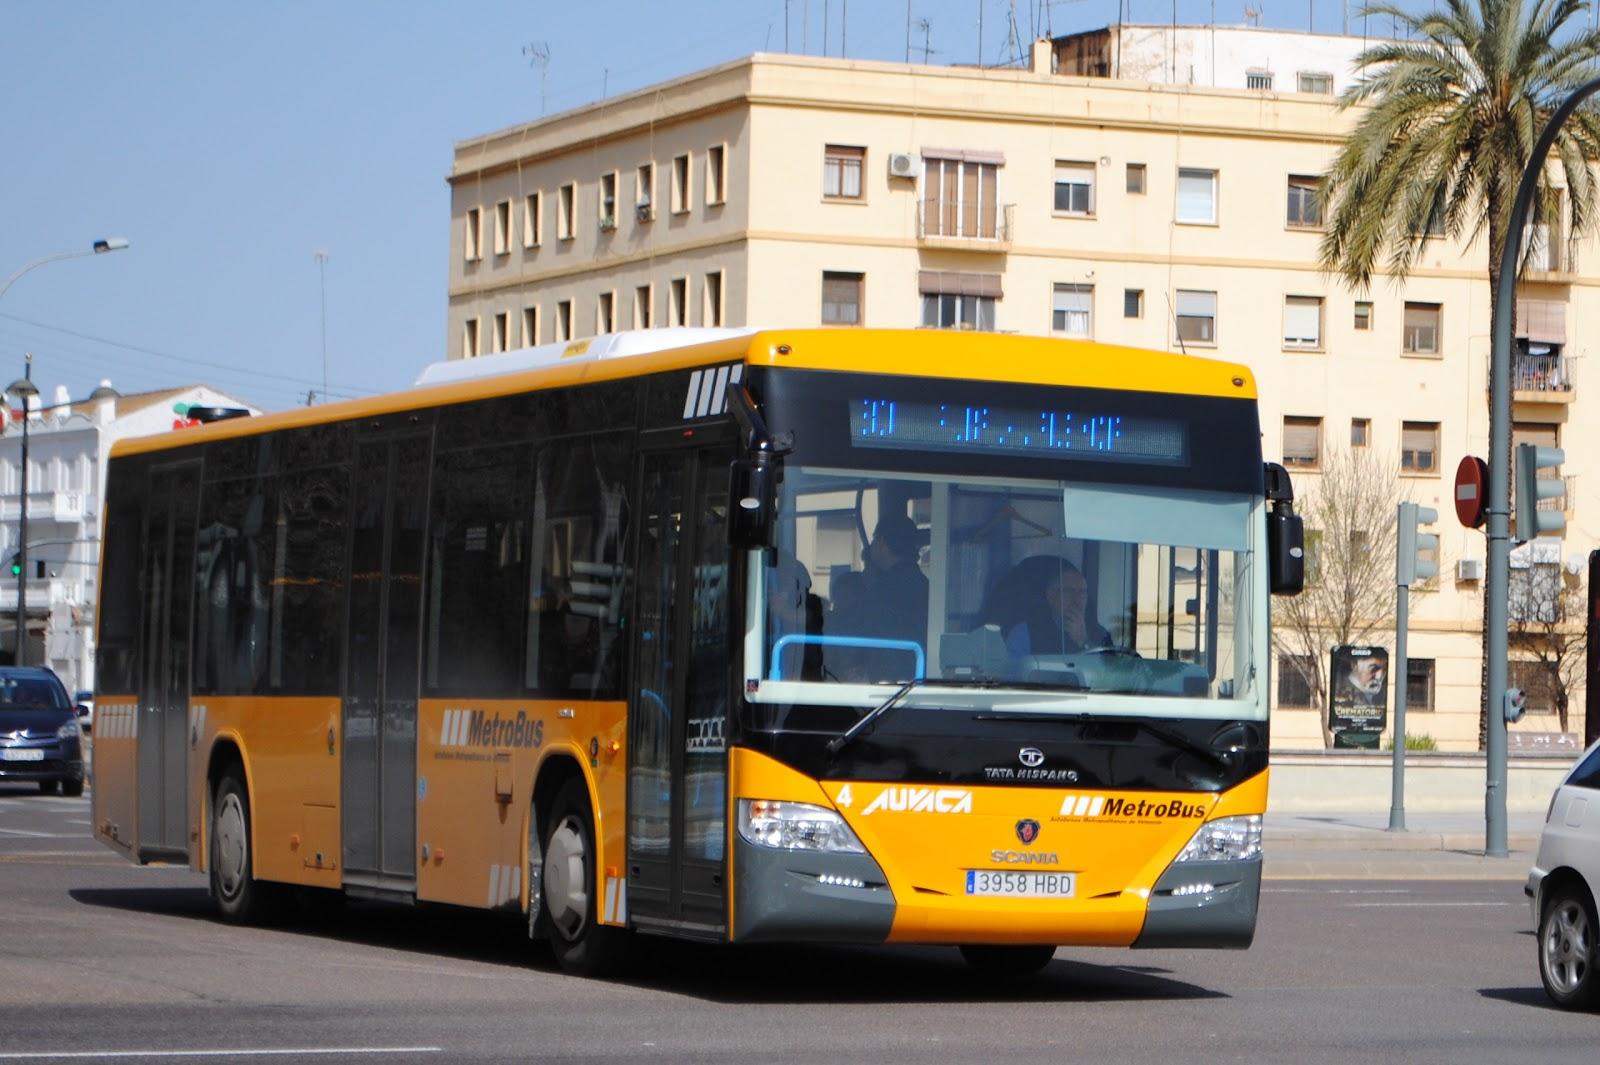 autobuses de valencia auvaca 4 linea metrob s 180